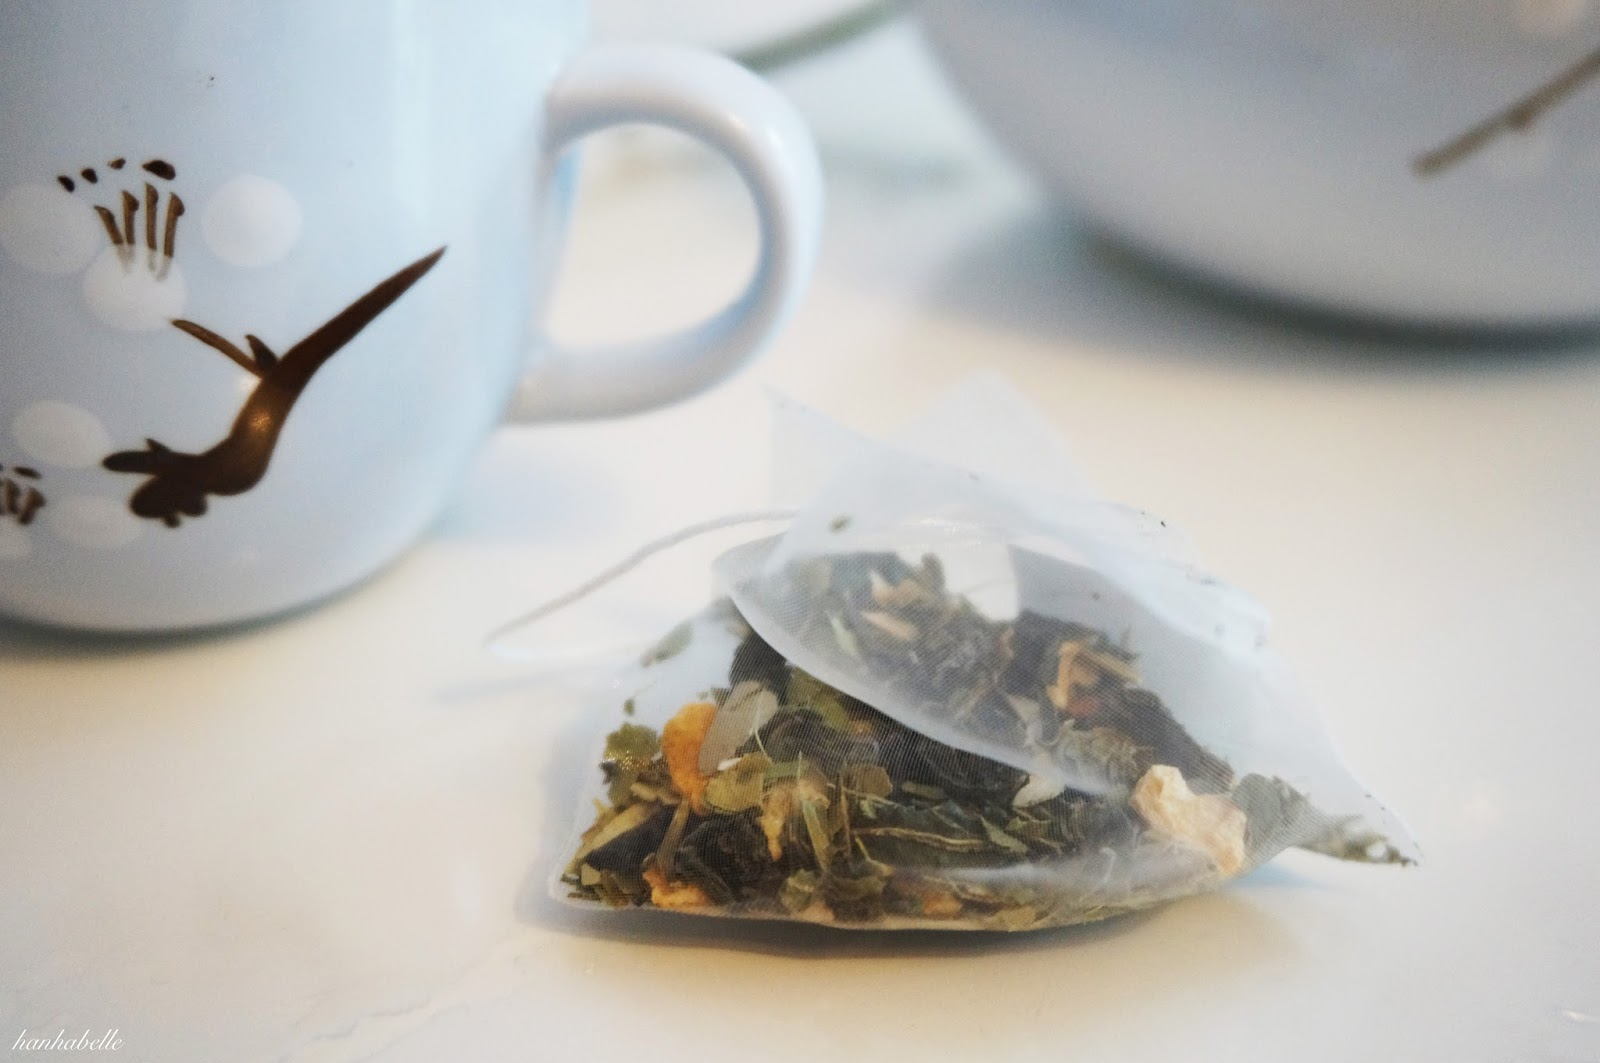 Slimcha tea